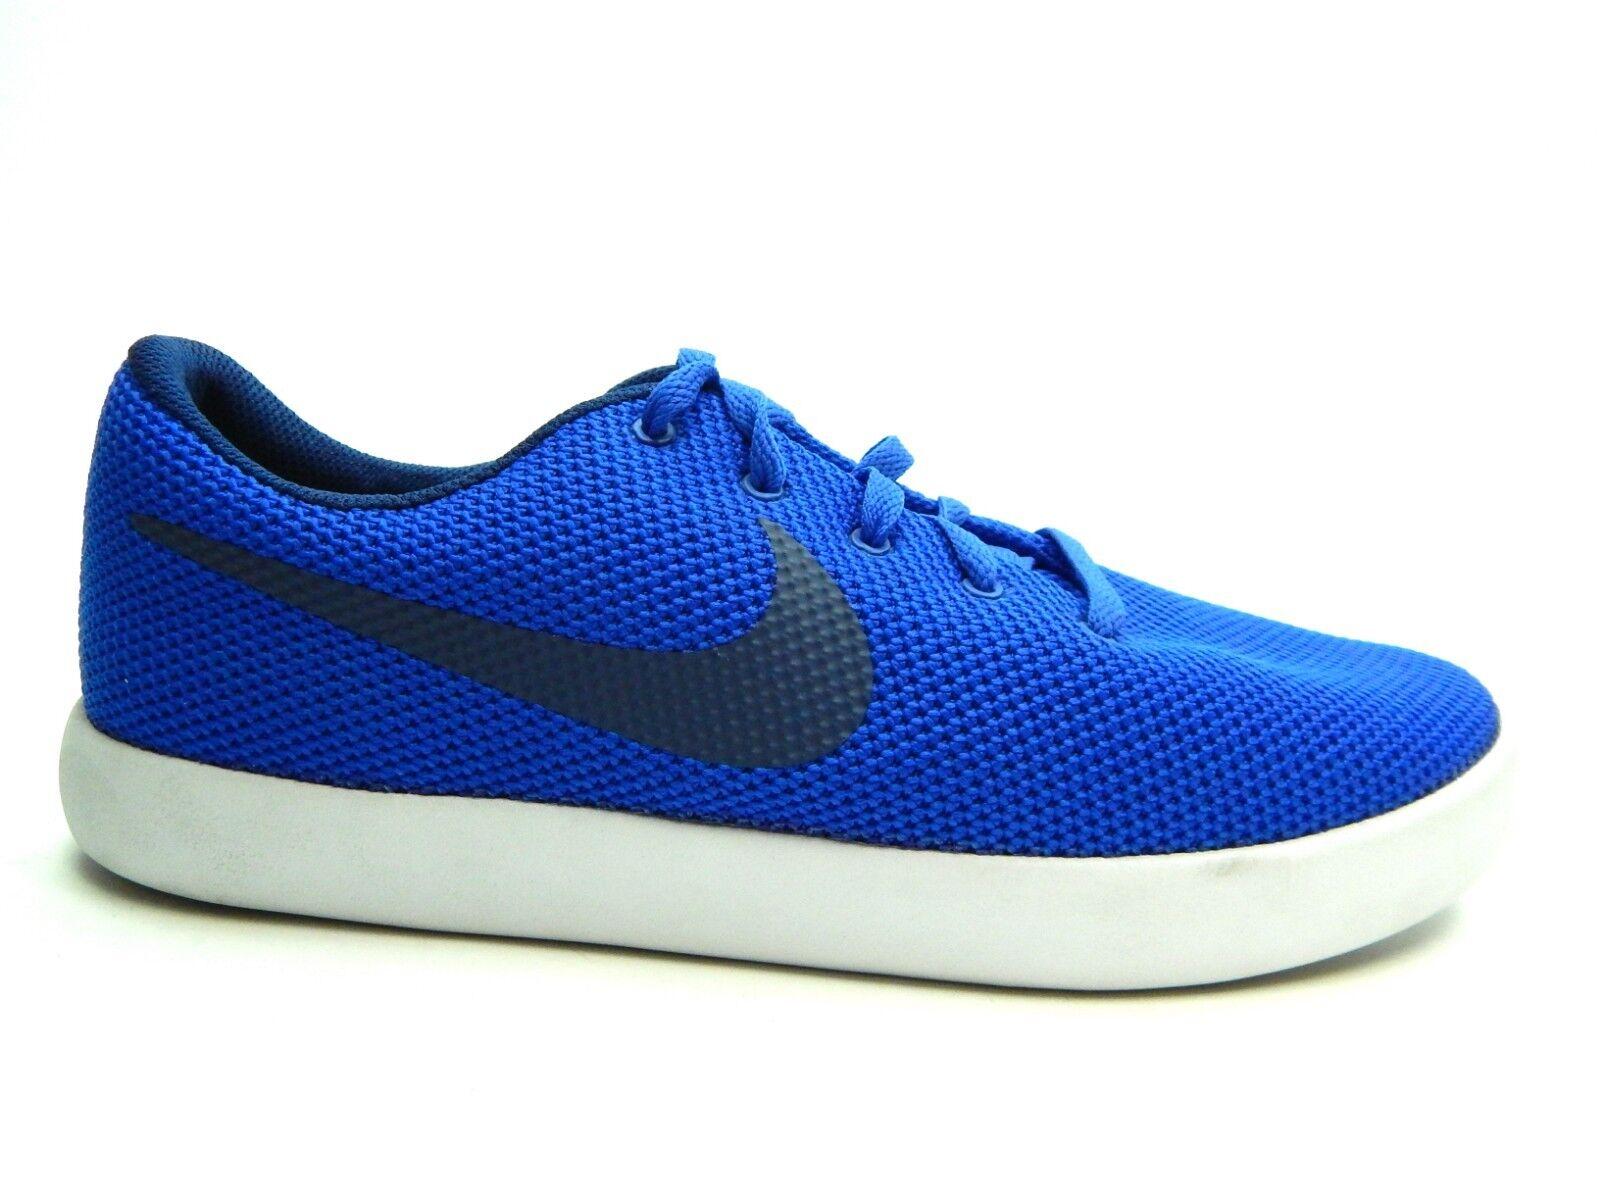 Nike - essenzialistischen  schuhe racer blau treu, blau - e  10,5 819810 441